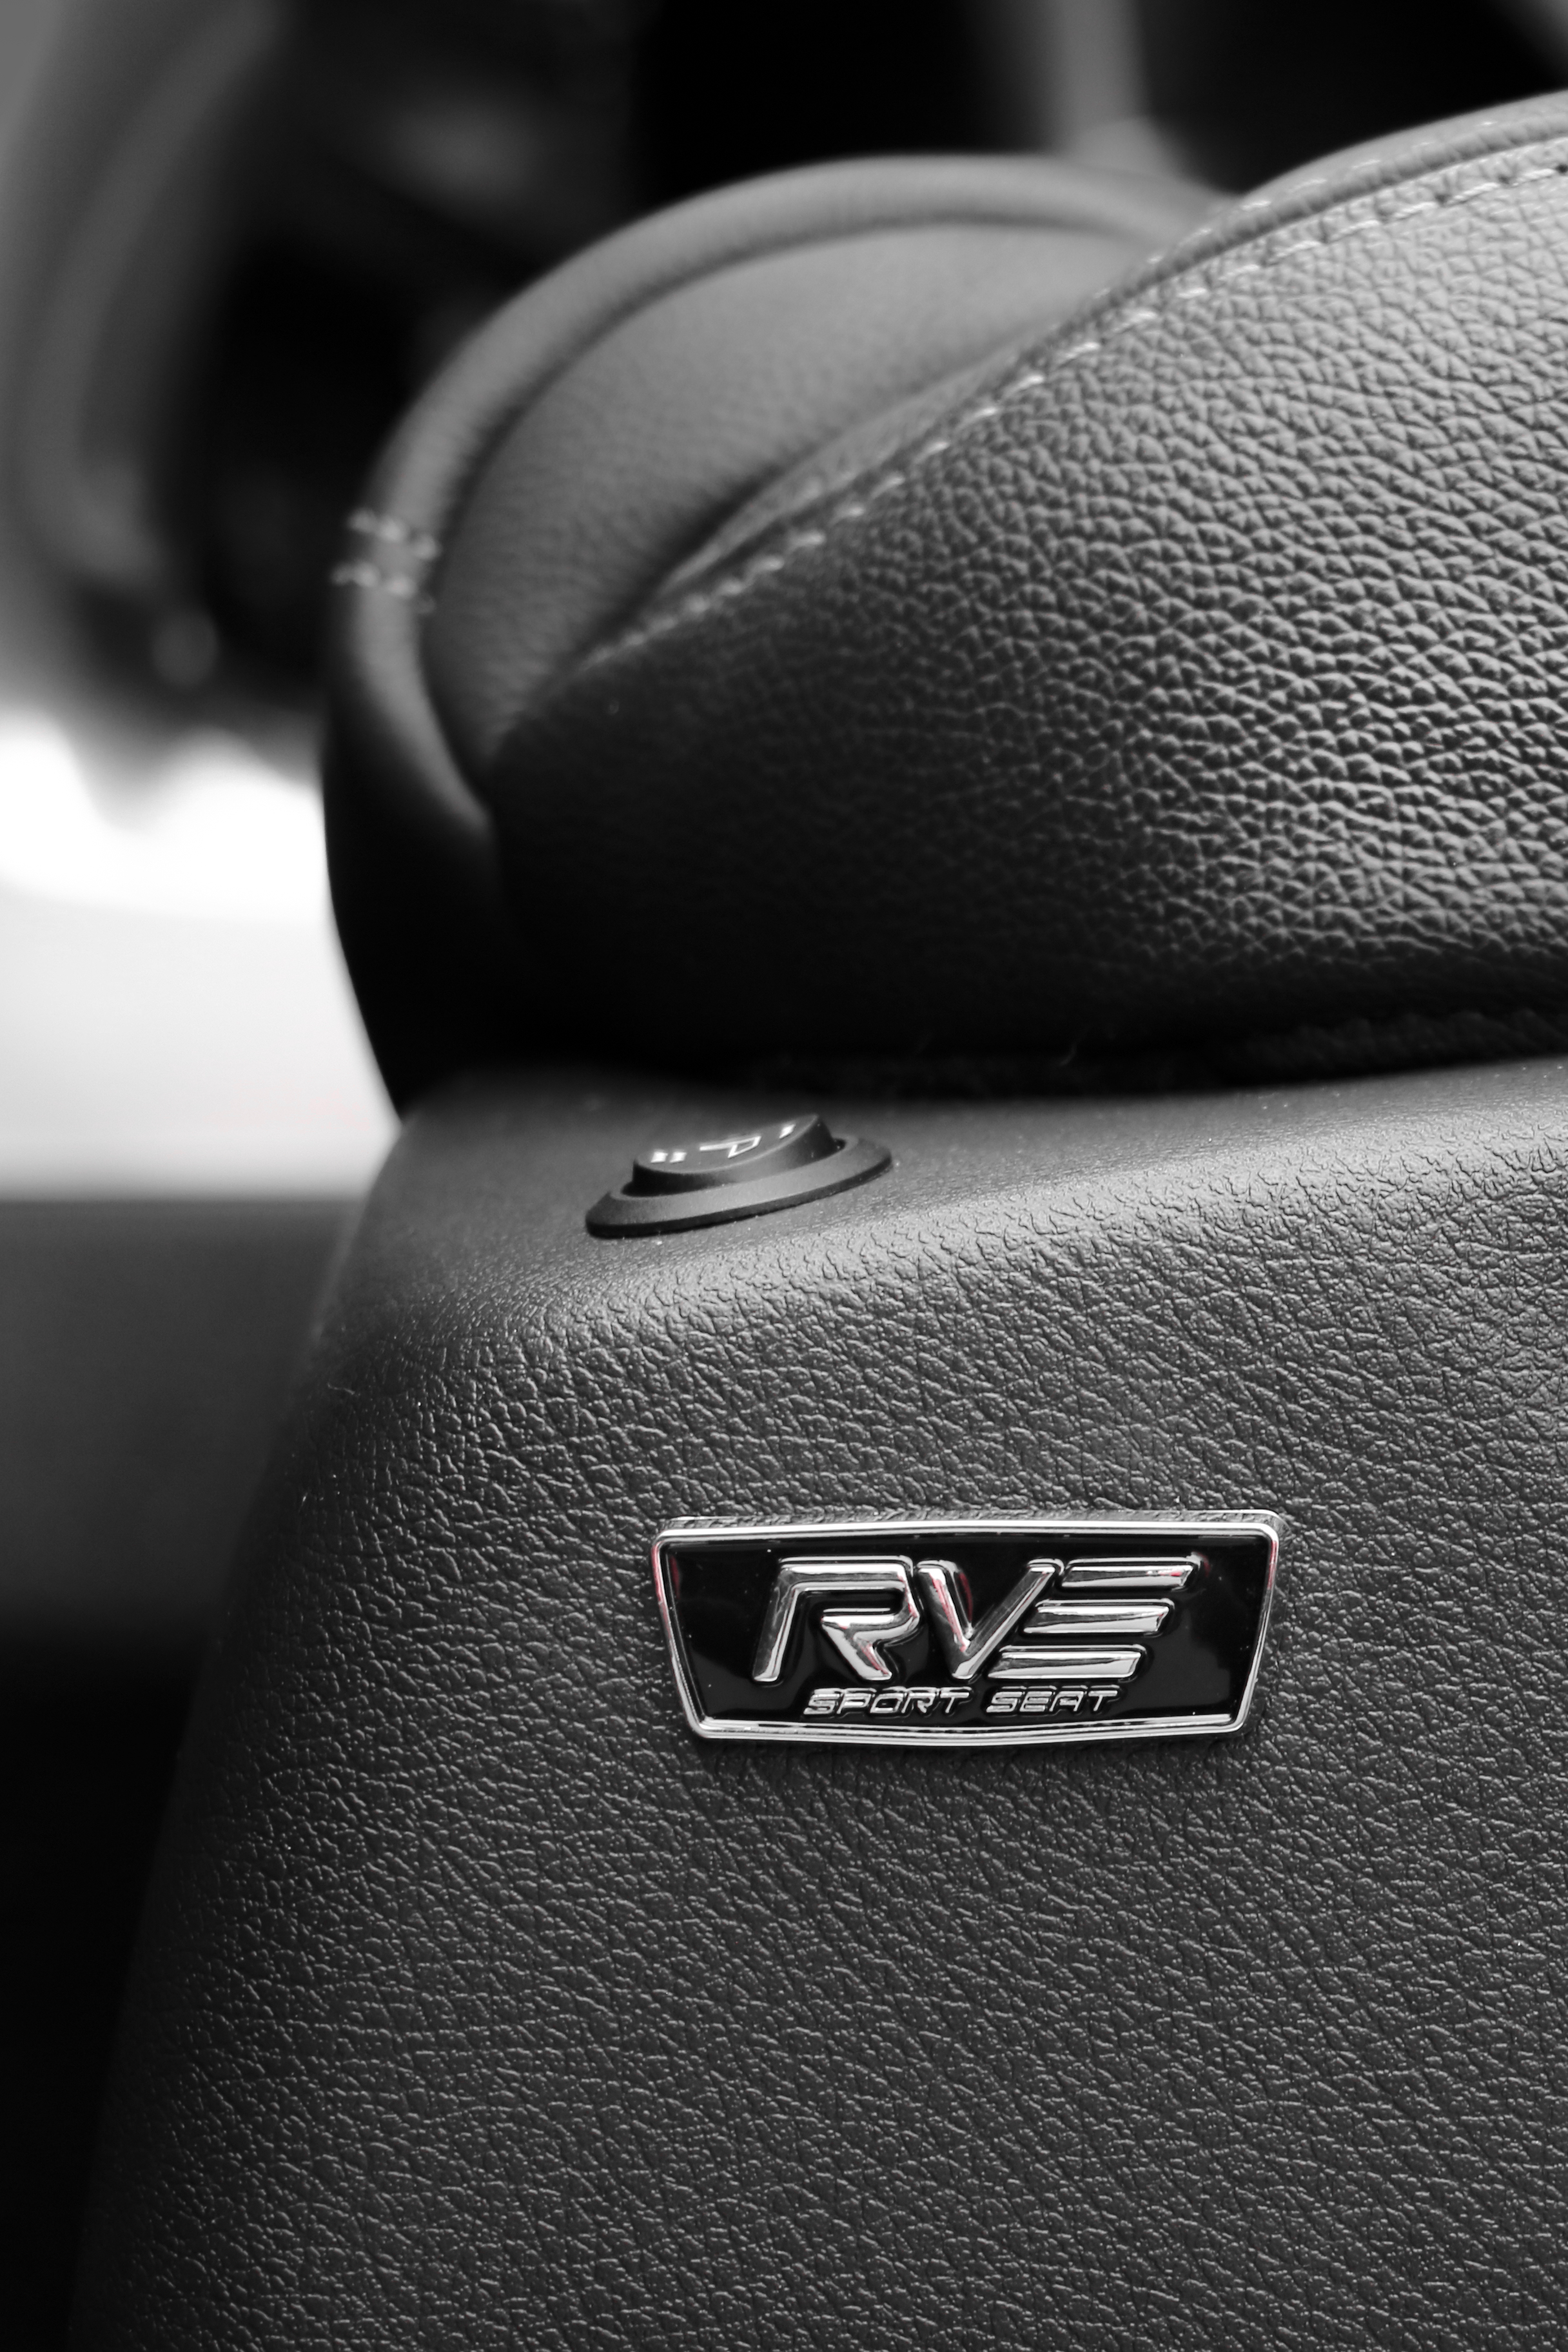 RVE-Sport-Seat-Monza-Badge-Brand.jpg